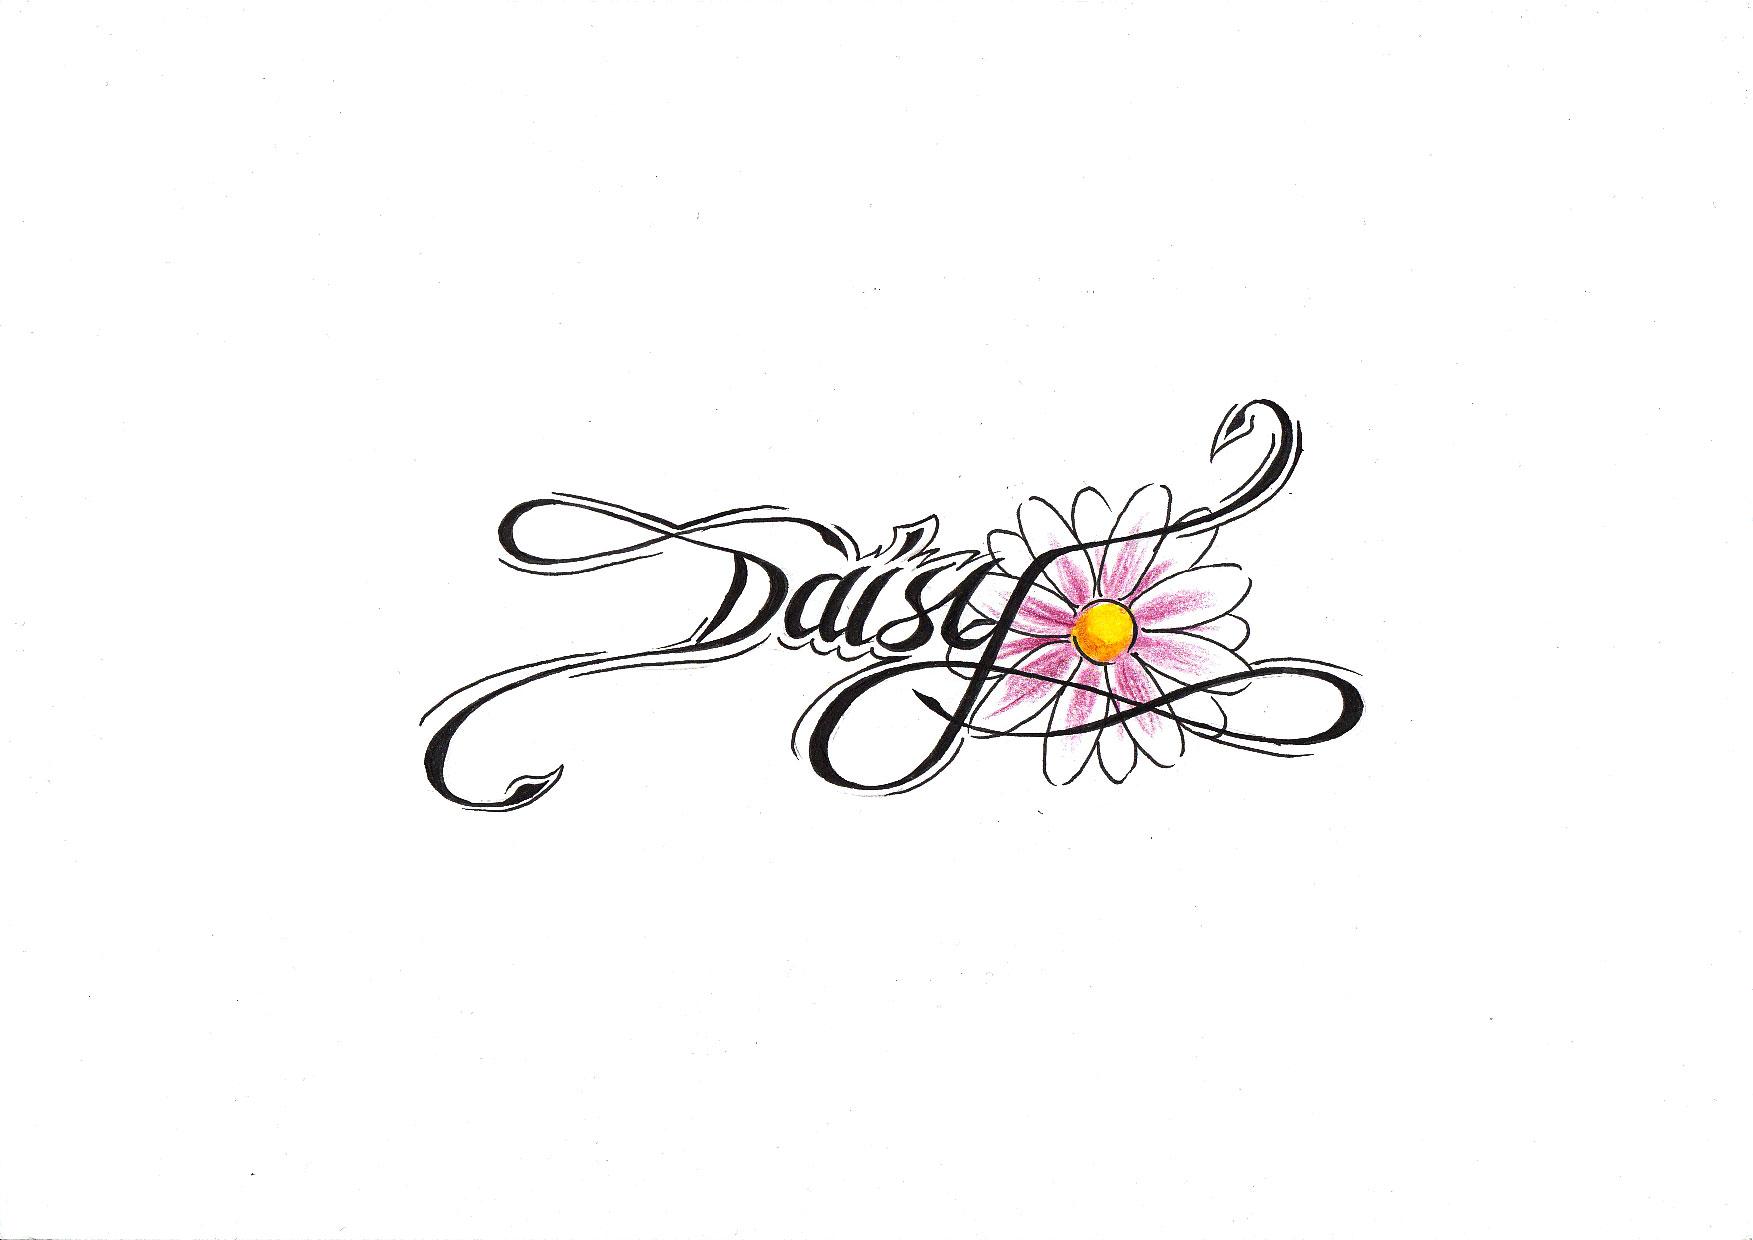 Daisy Flower Tattoo Design